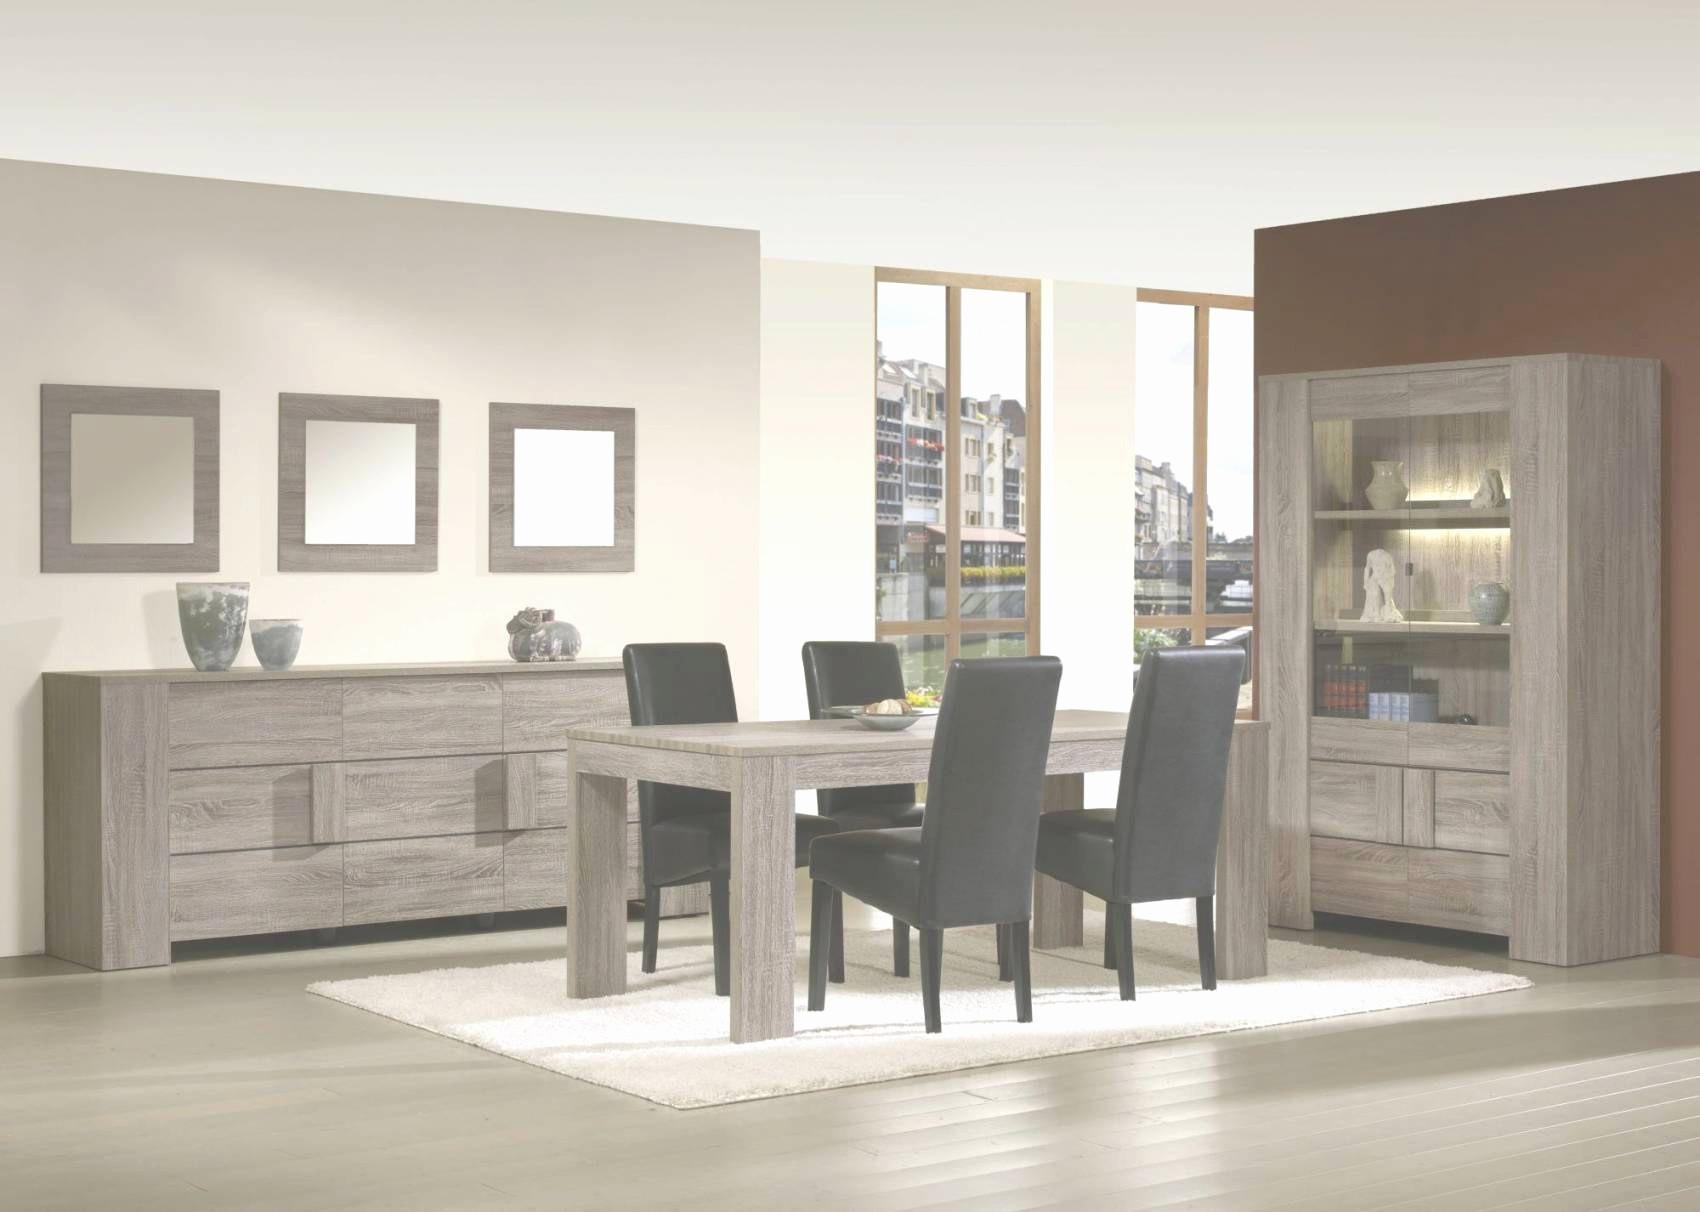 deco meuble salon meuble de coiffure mobilier de jardin deco genial hd paysage luxe of deco meuble salon